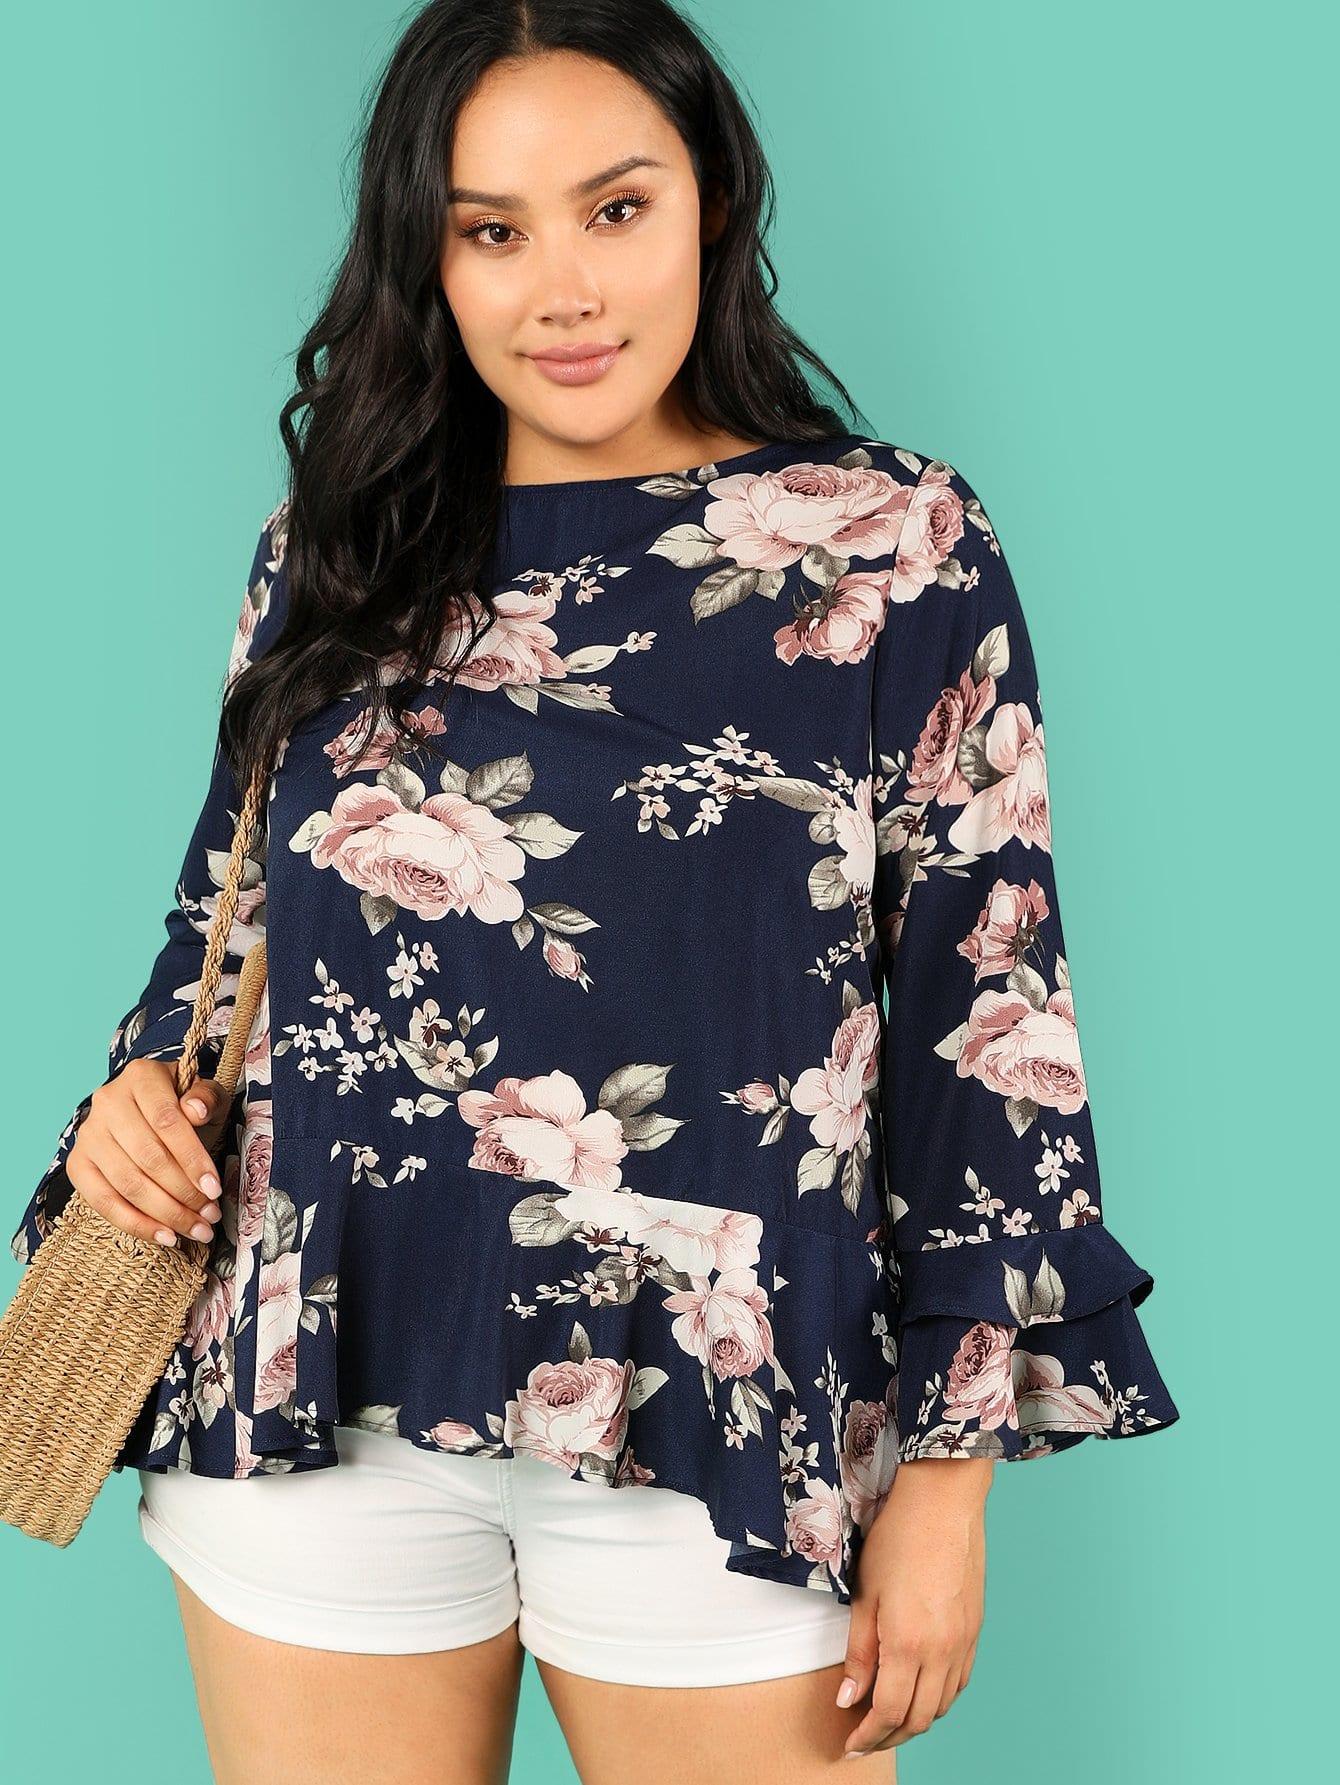 Plus Flower Print Ruffle Trim Blouse ruffle trim floral print blouse